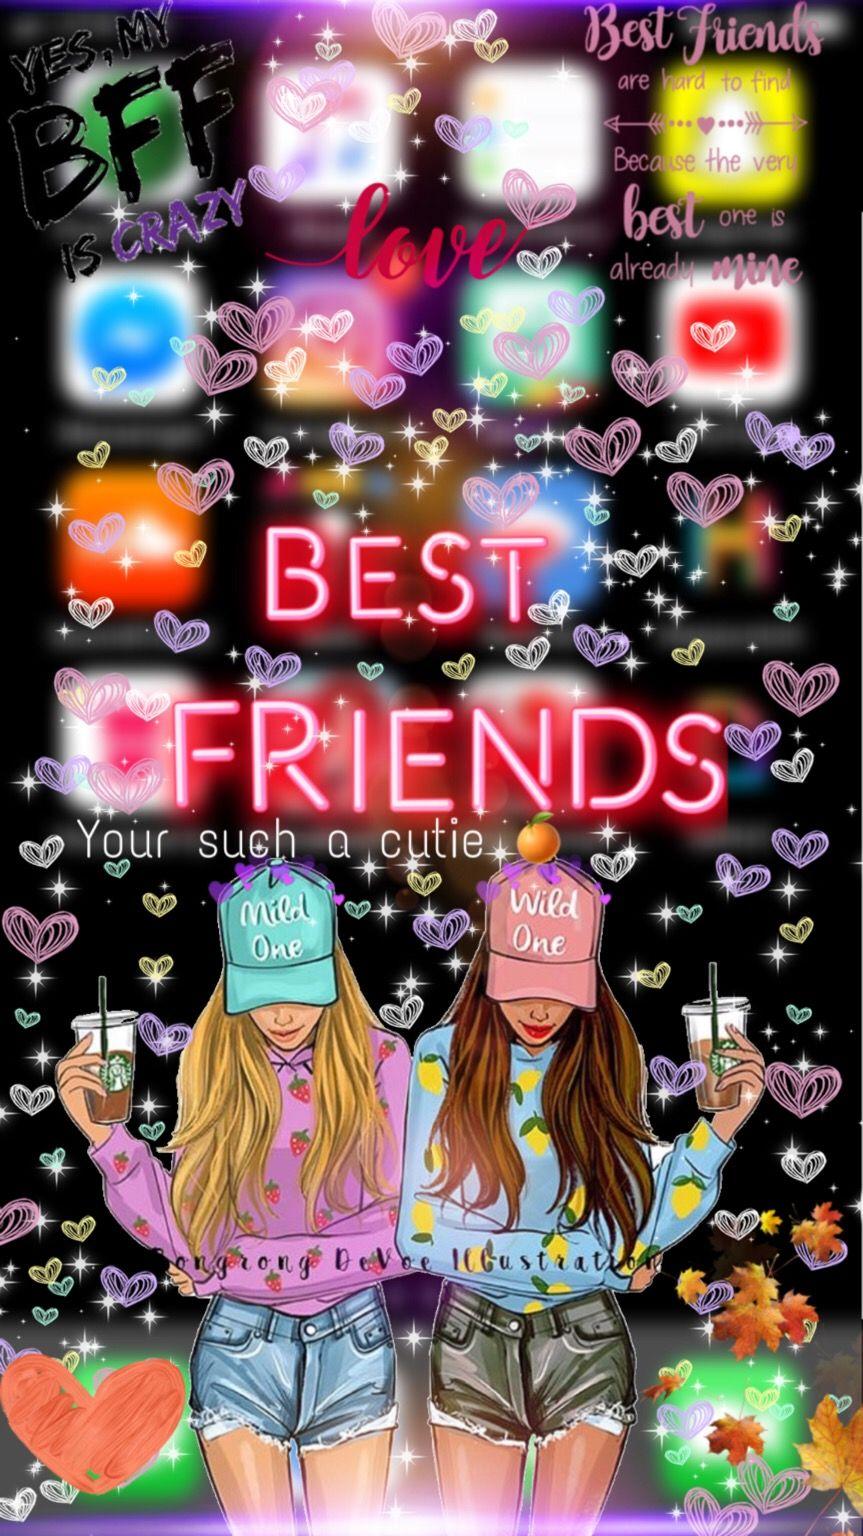 Bestfriend Wallpaper Add My Instagram Dizzyrose1371 Add My Snapchat Xxsnipertorixx If You Want One Just Ask Instagram And Snapchat Wallpaper Iphone Wallpaper